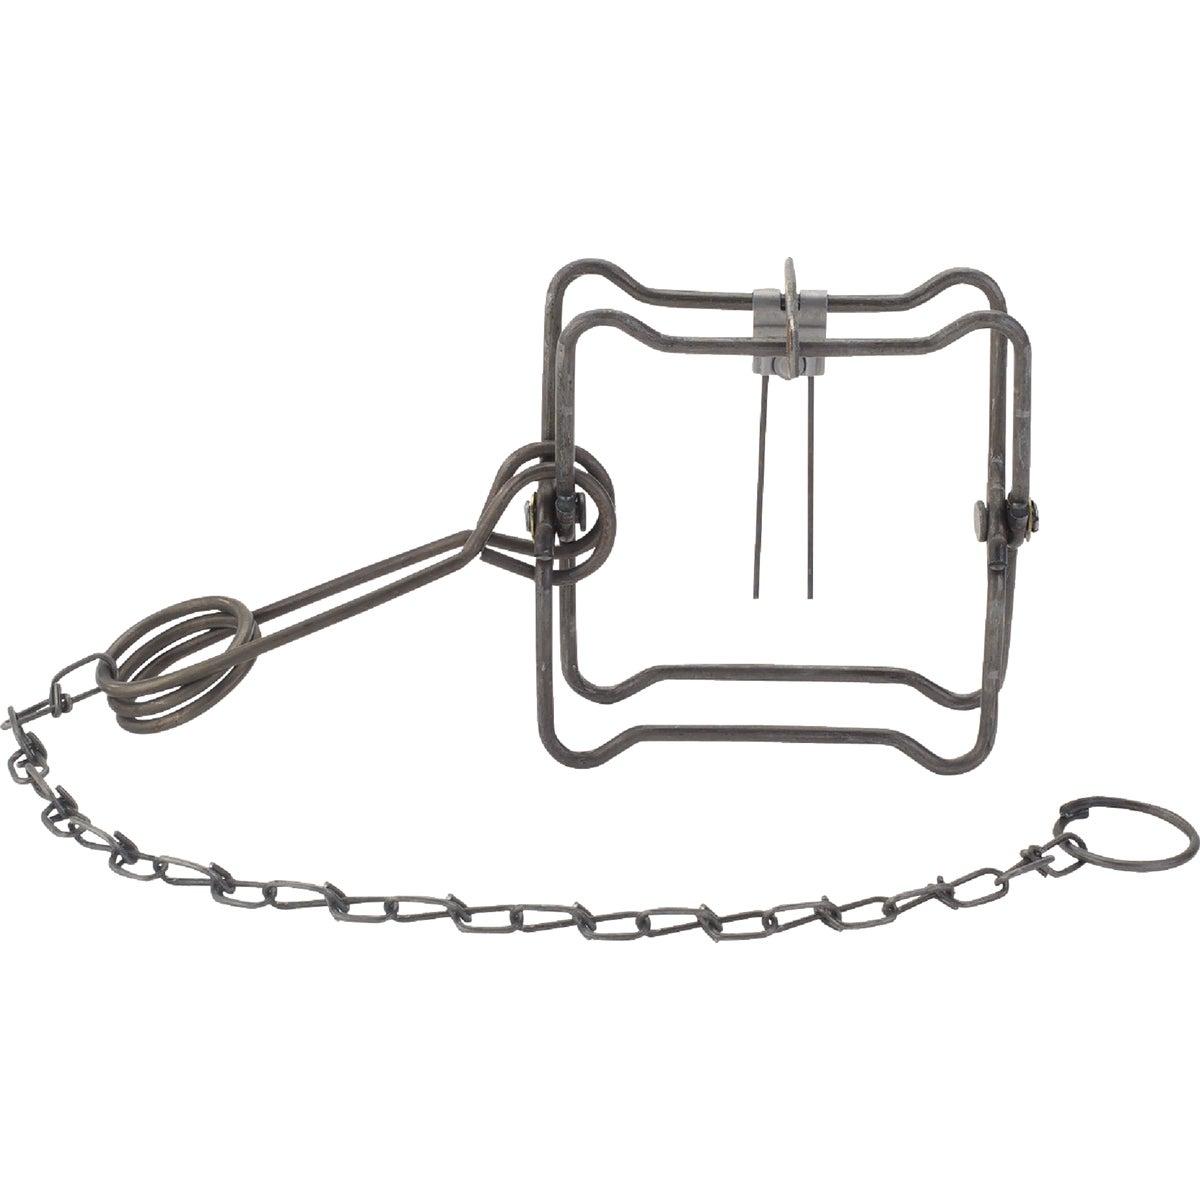 #110 Body Trap